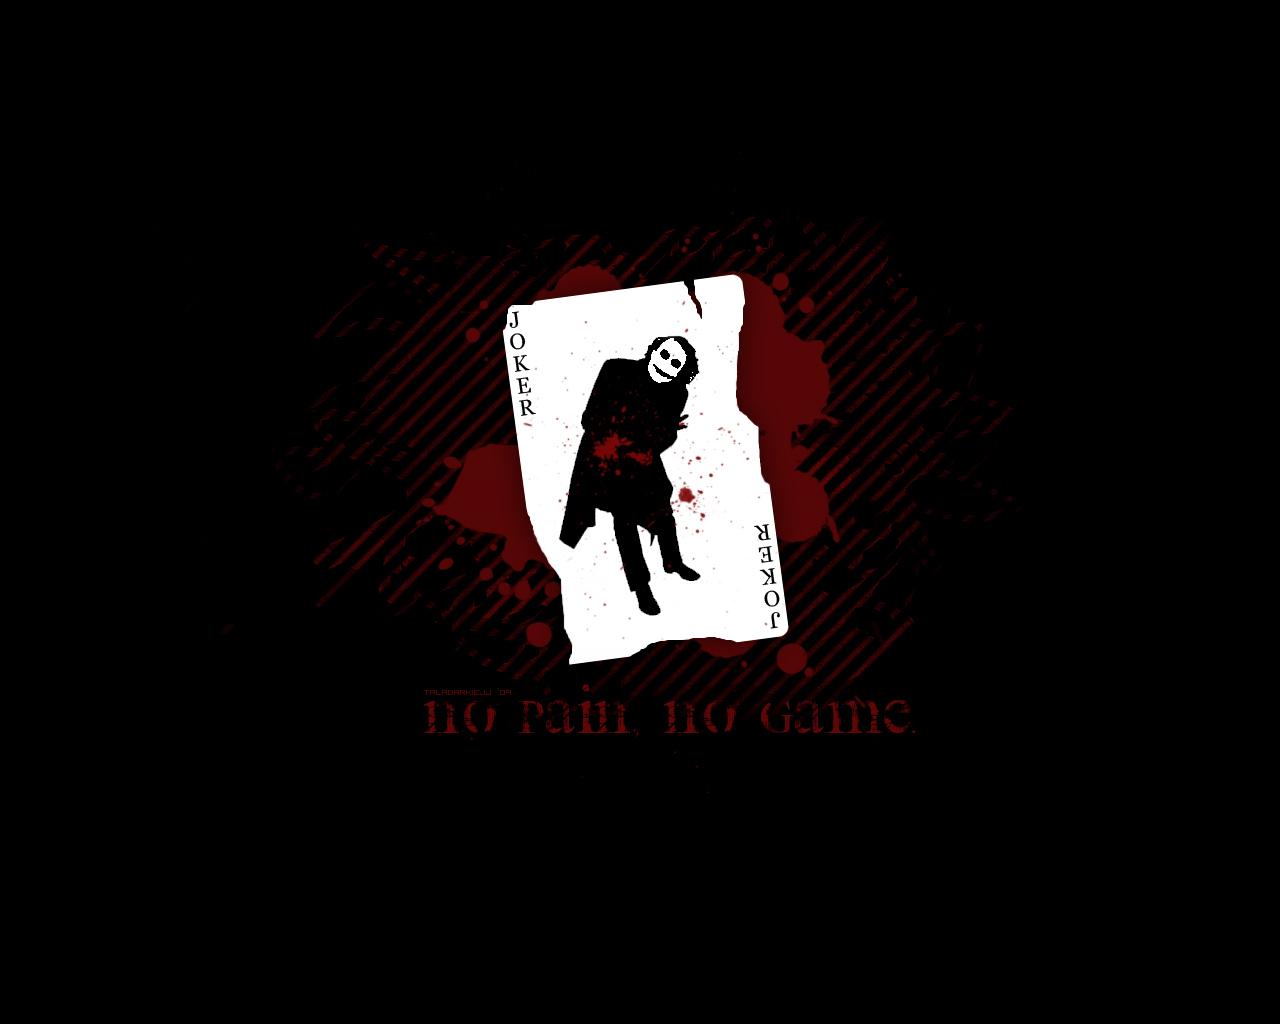 joker card desktop background | image wallpaper collections